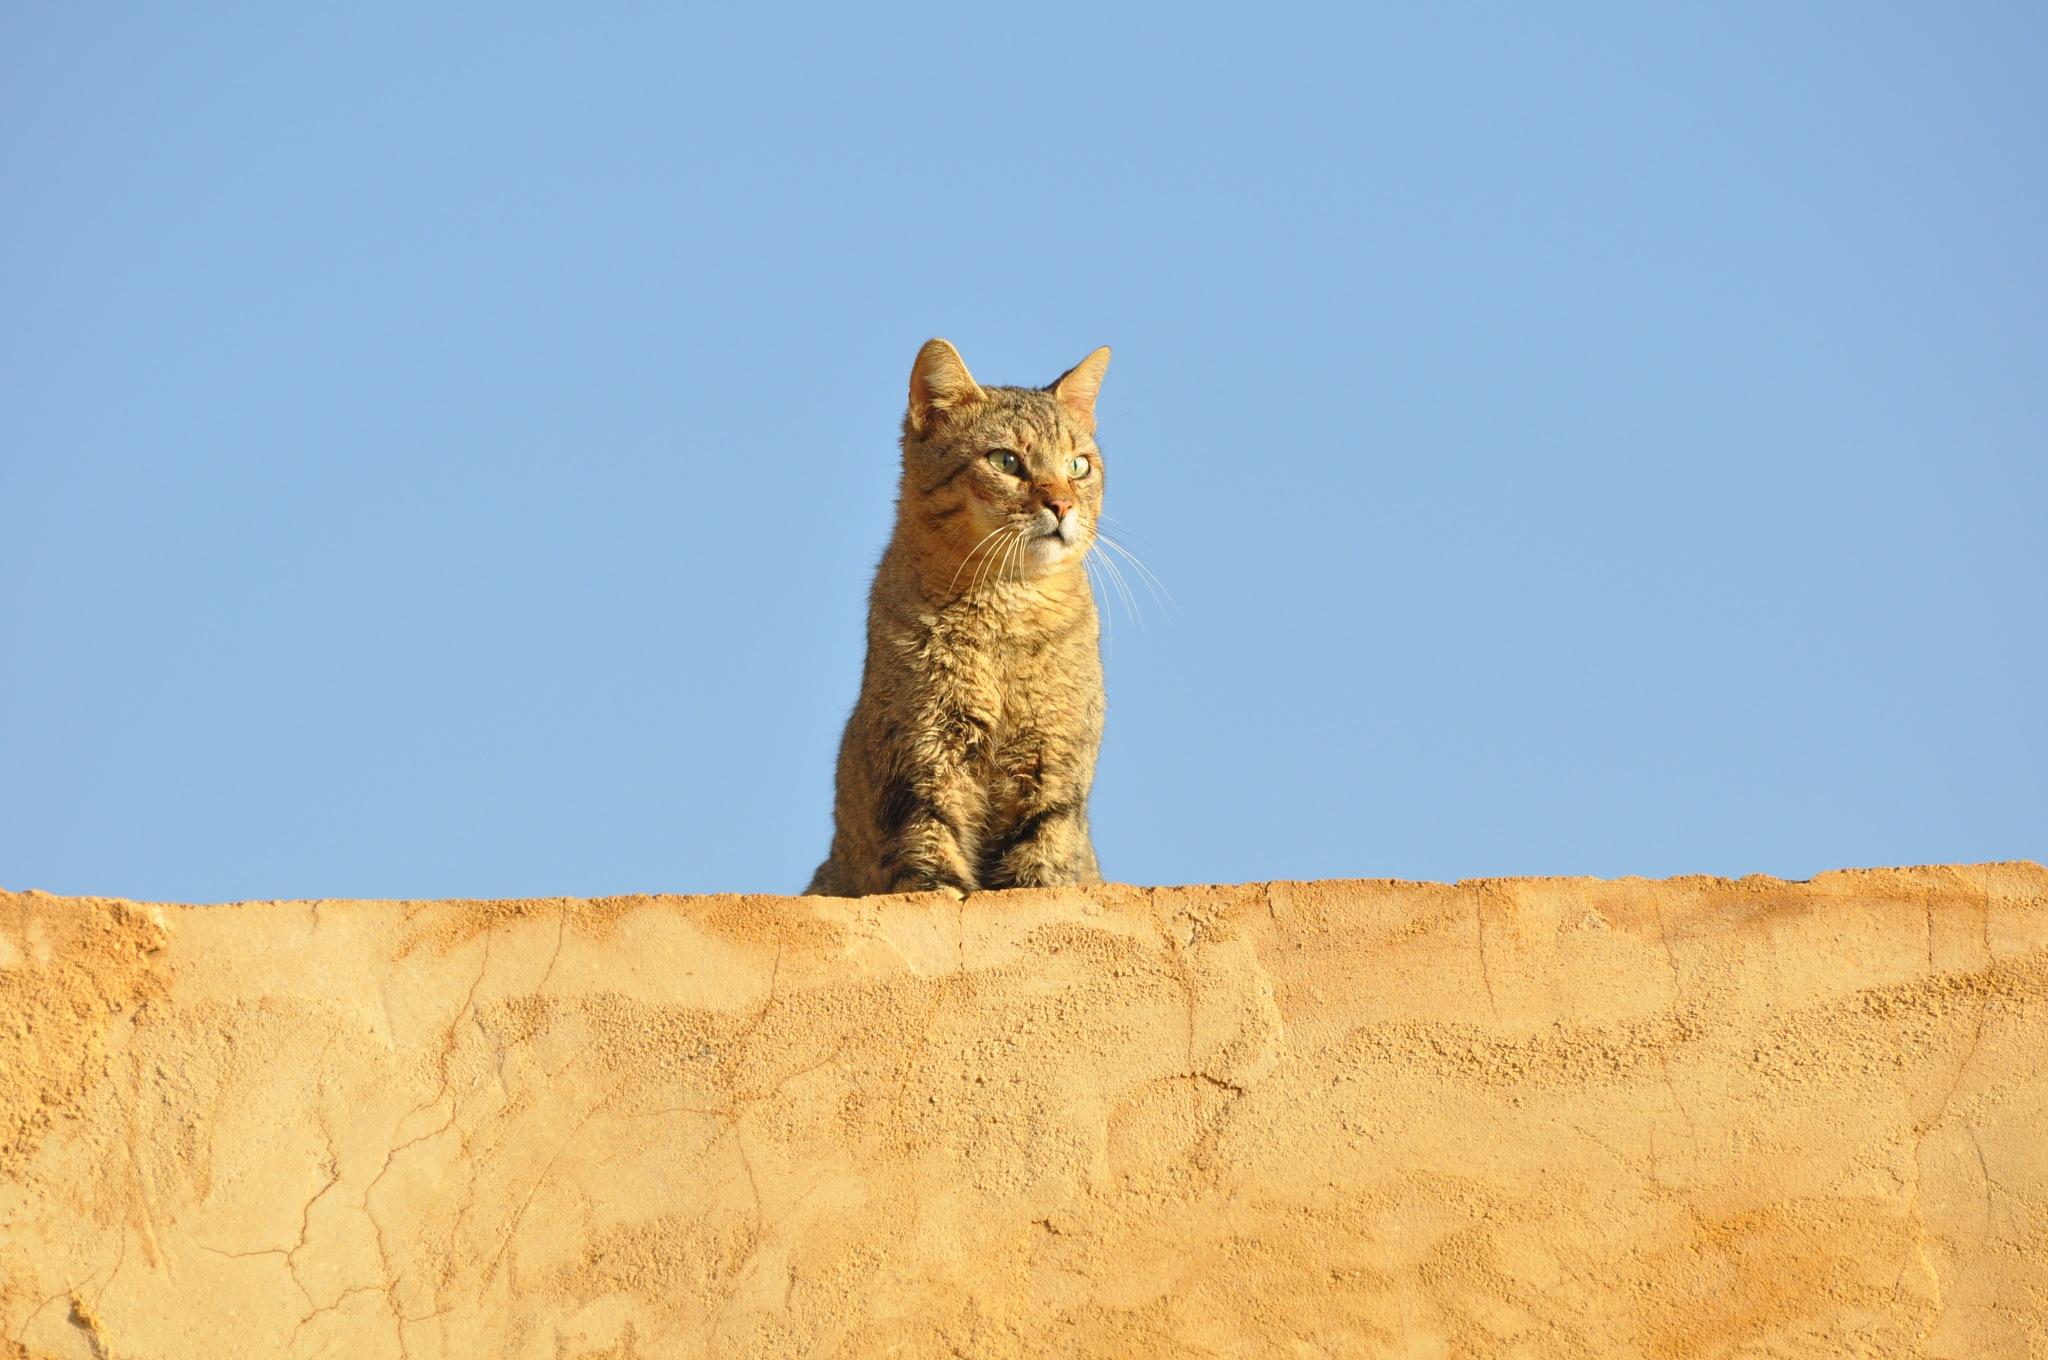 #CAT by Saber Omran